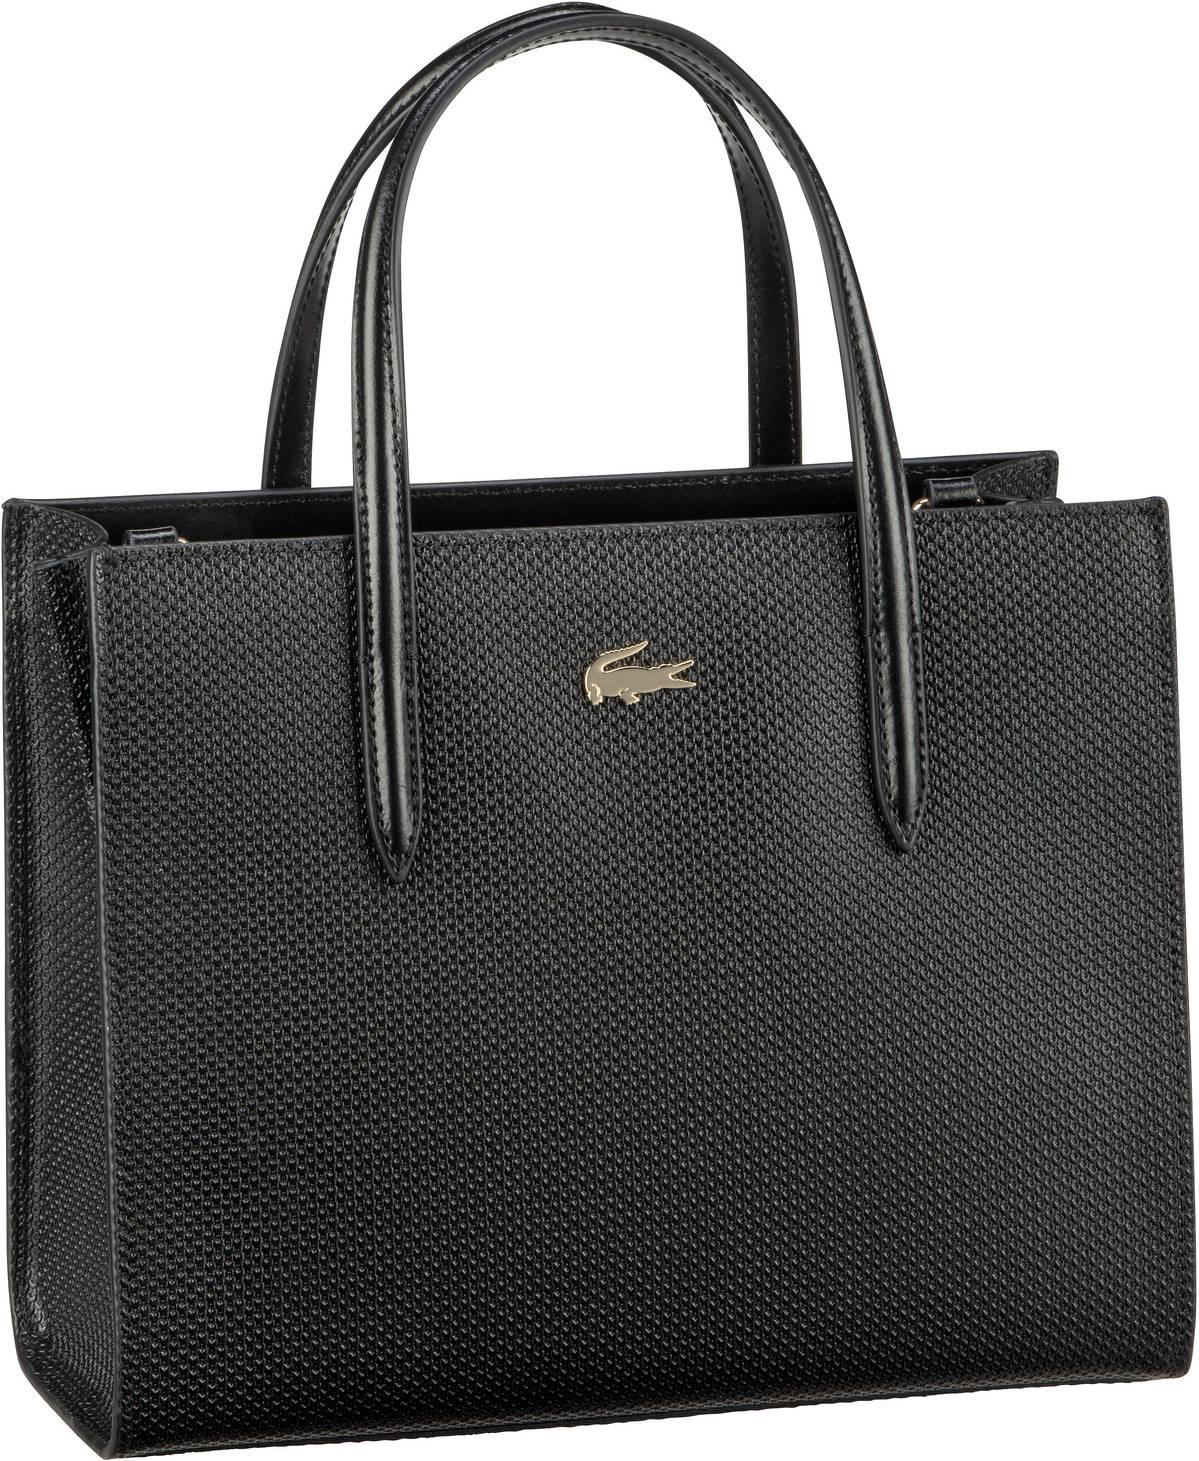 Handtasche Chantaco Tote Bag 2562 Black